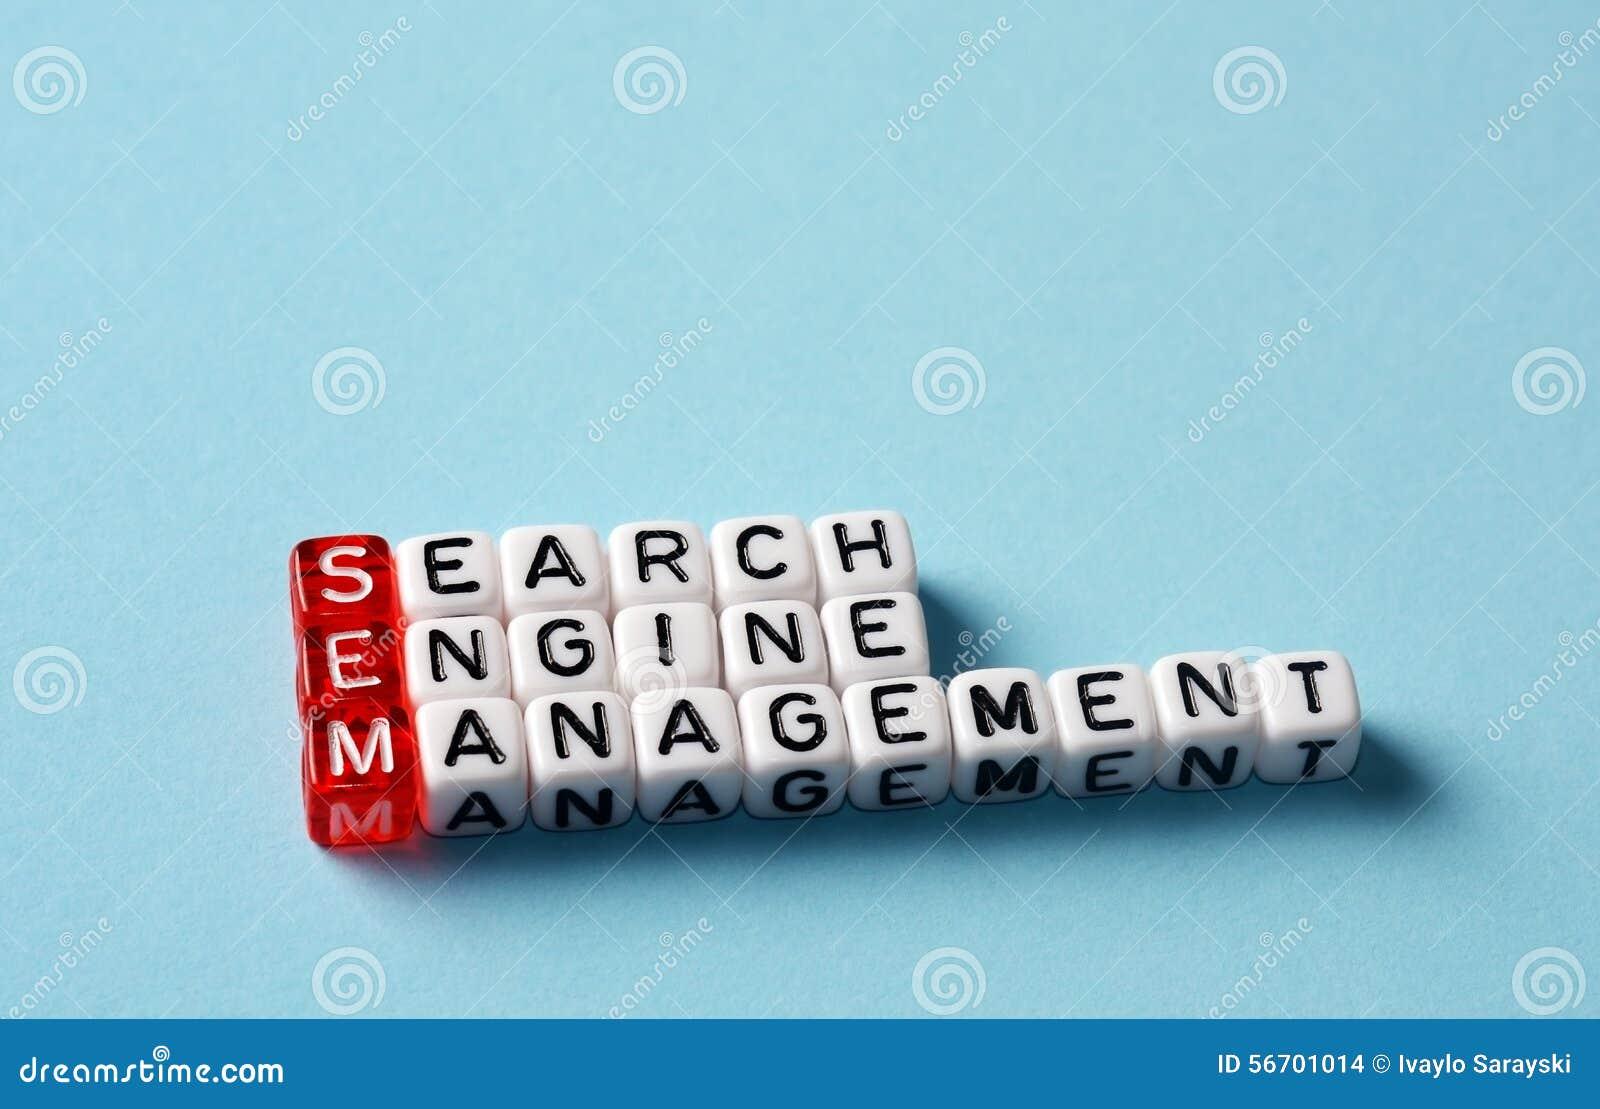 SEM Search Engine Management Stock Photo